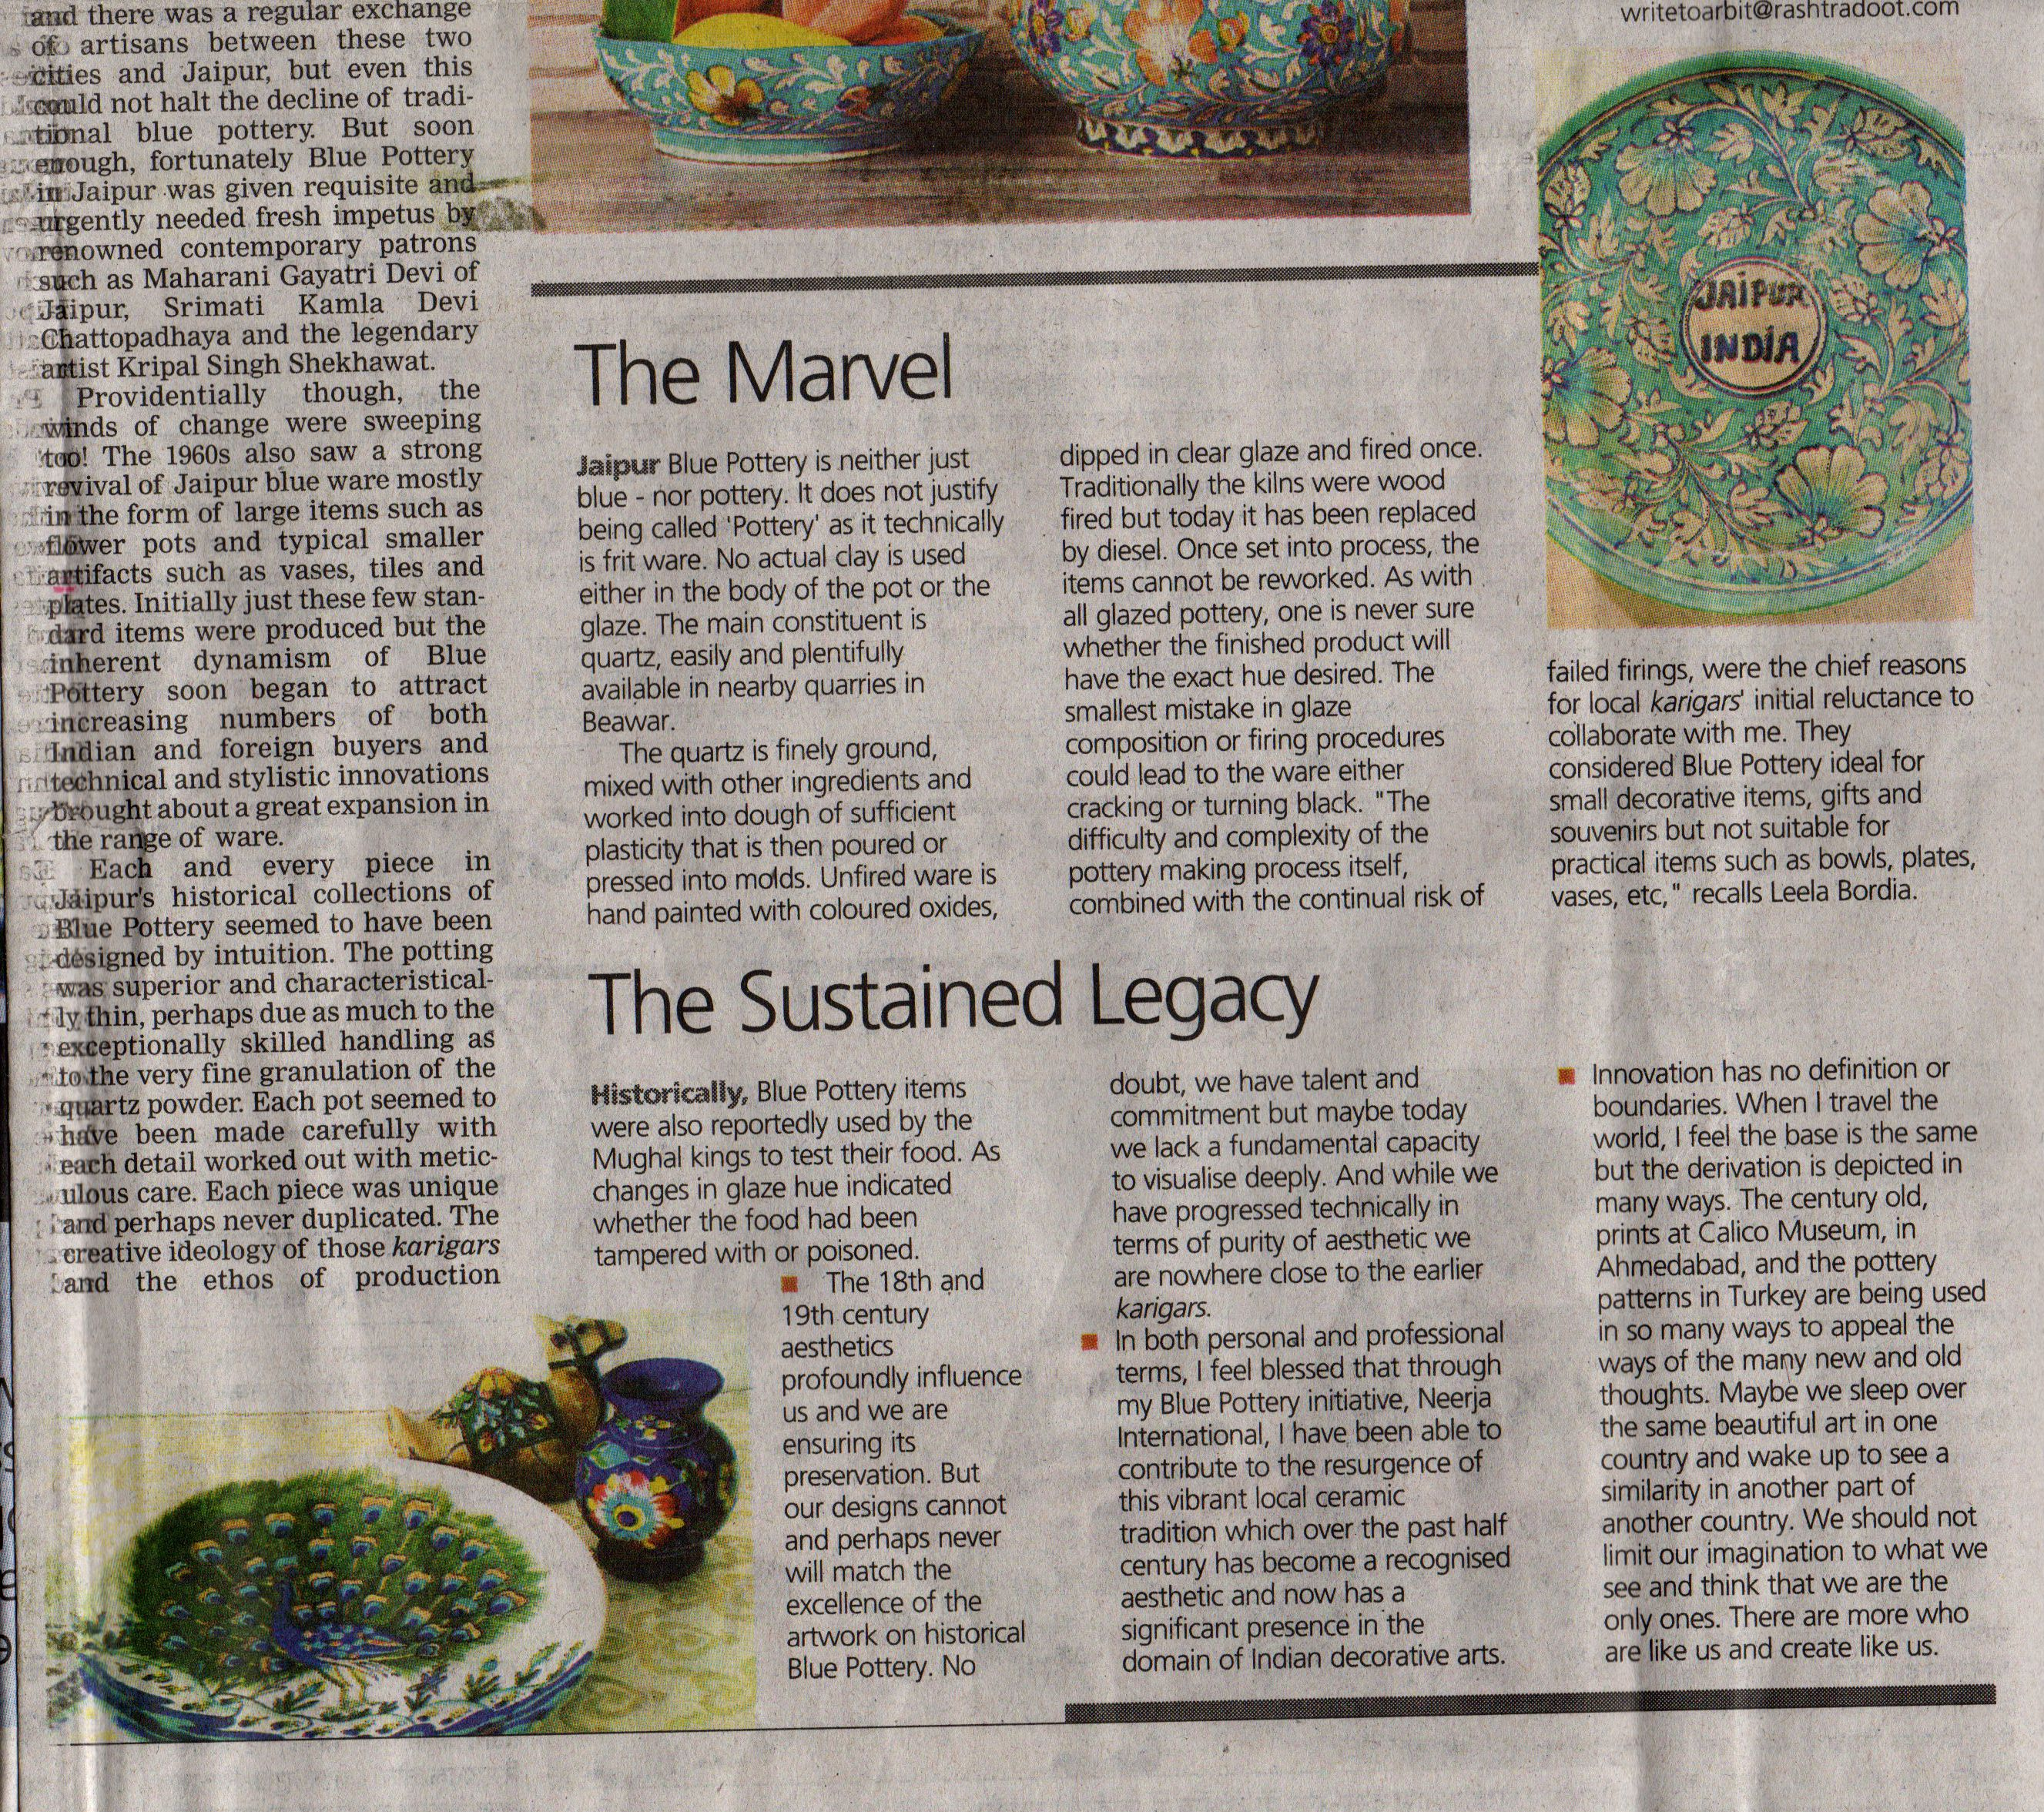 Leela Bordia - History of Blue Pottery